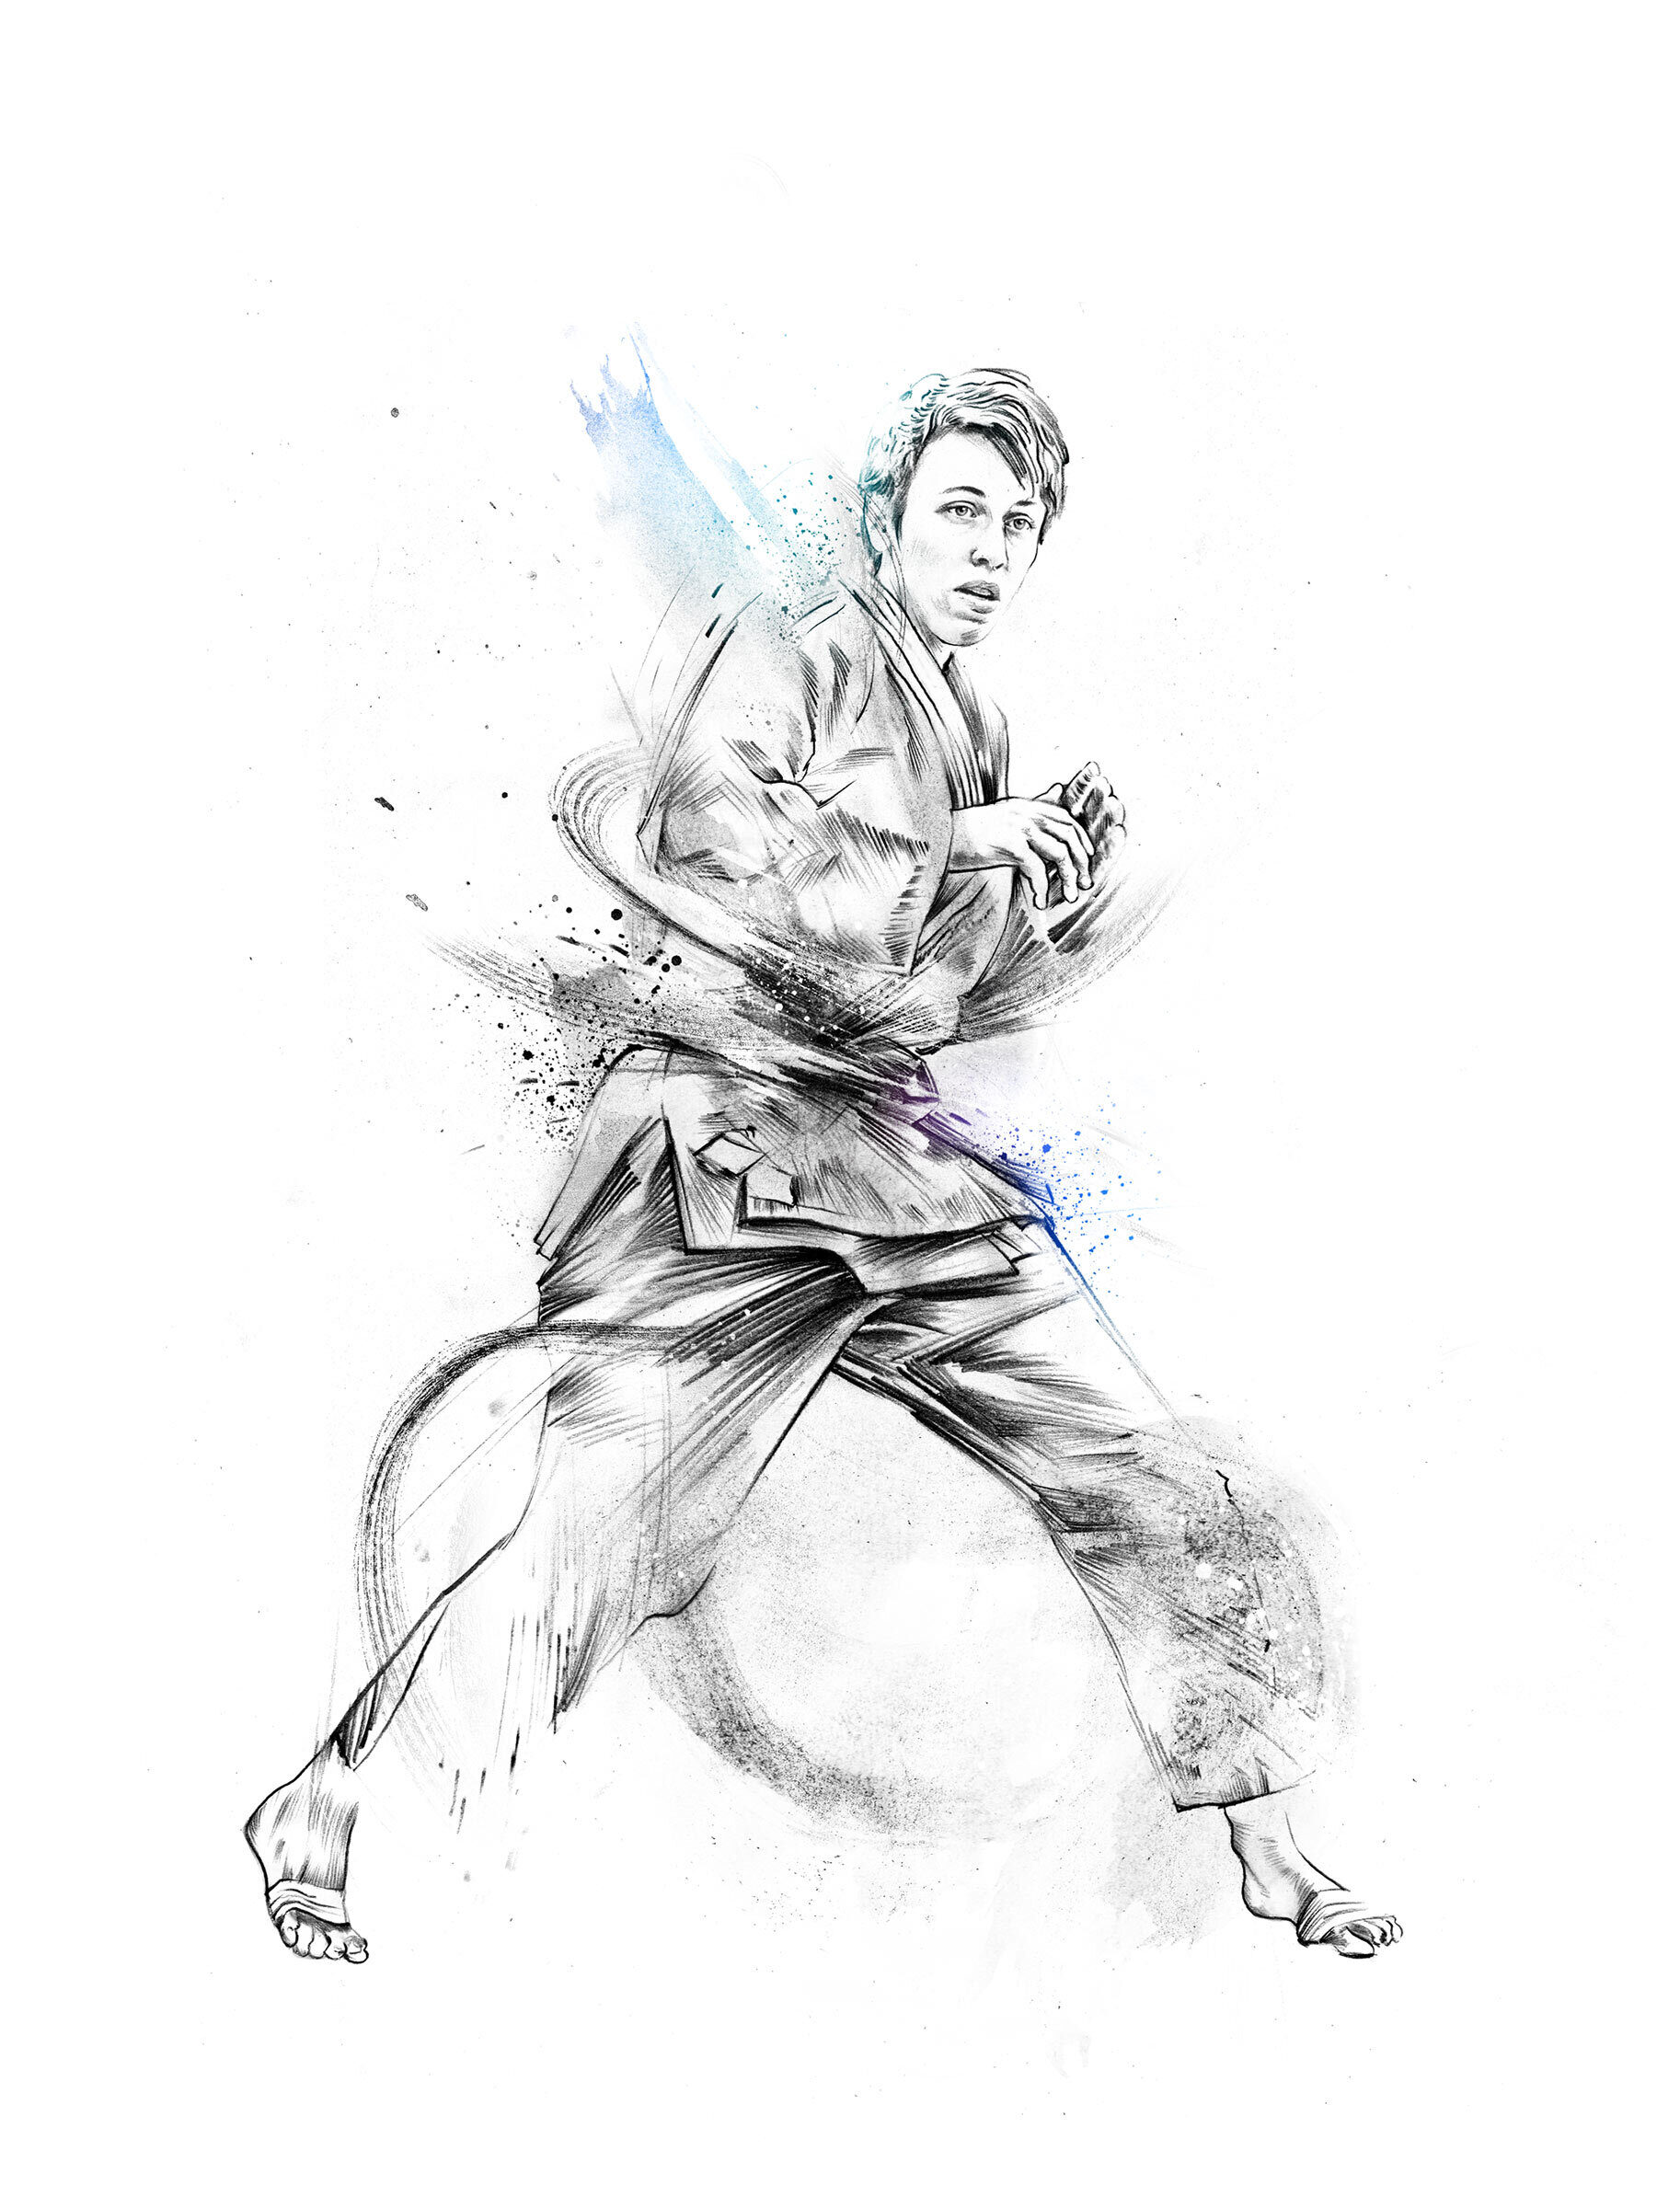 Judo sport illustration - Kornel Illustration | Kornel Stadler portfolio